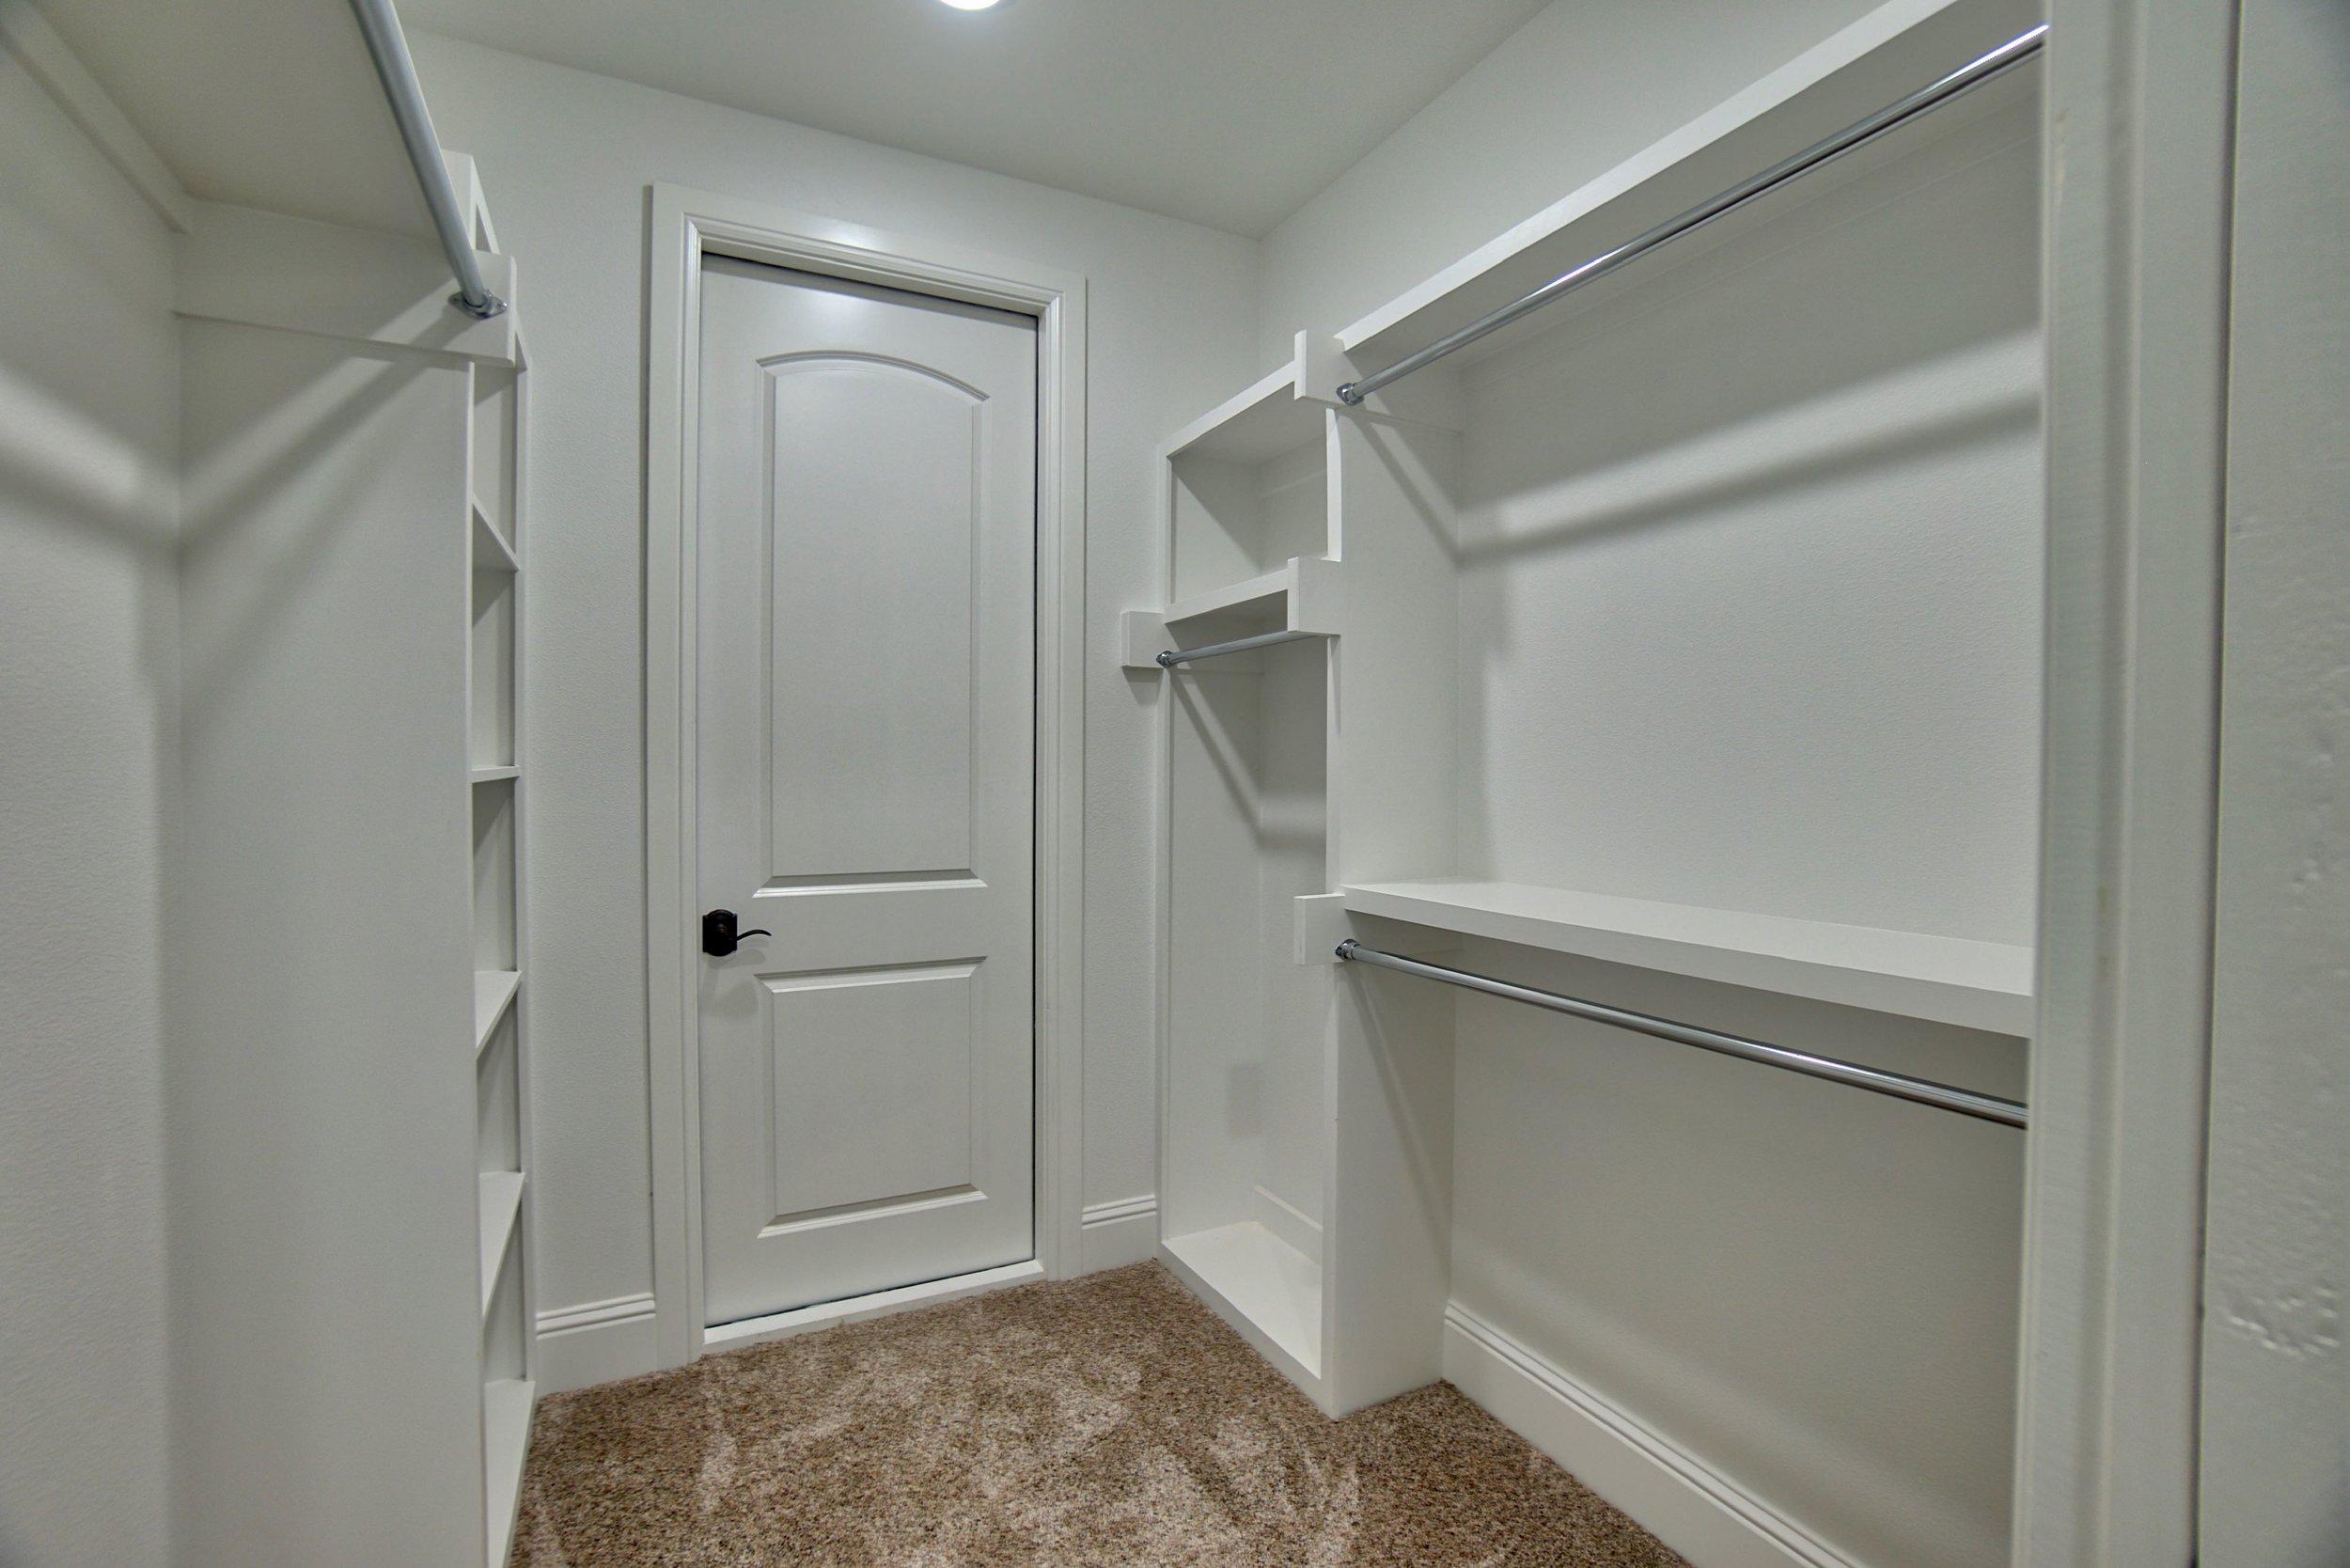 49 closet 1.jpg